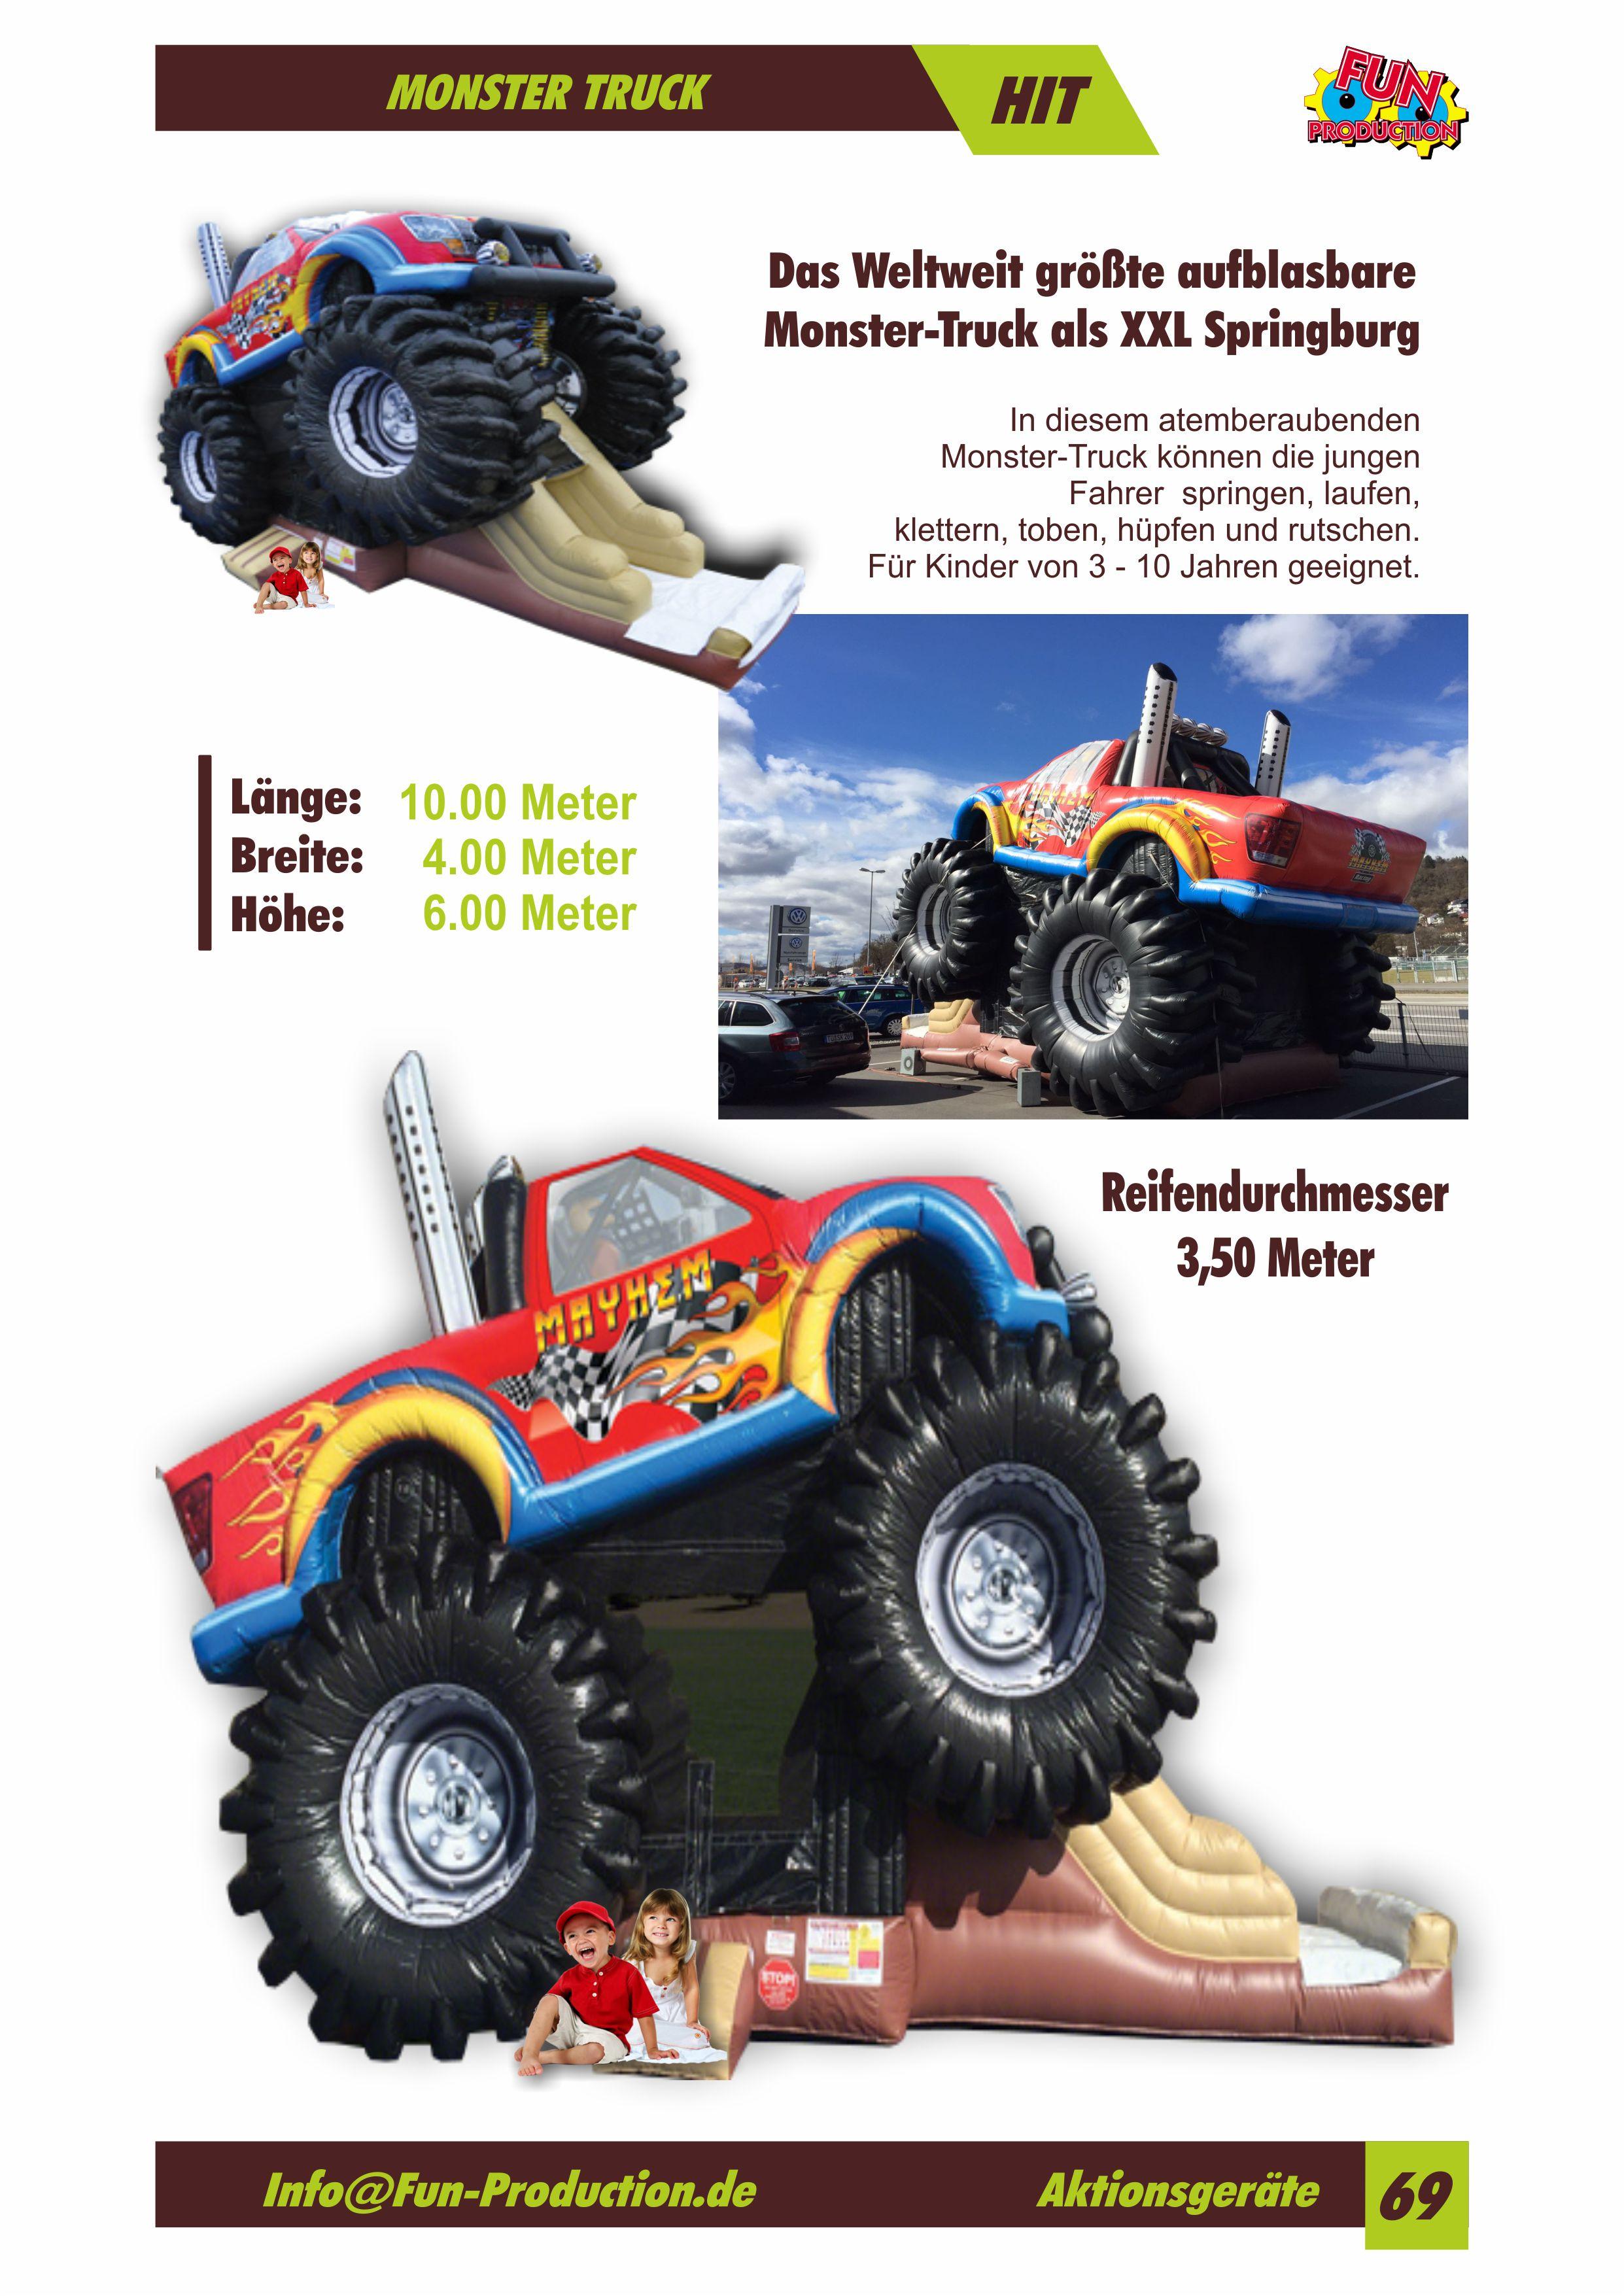 Monster Truck Fun Production GmbH